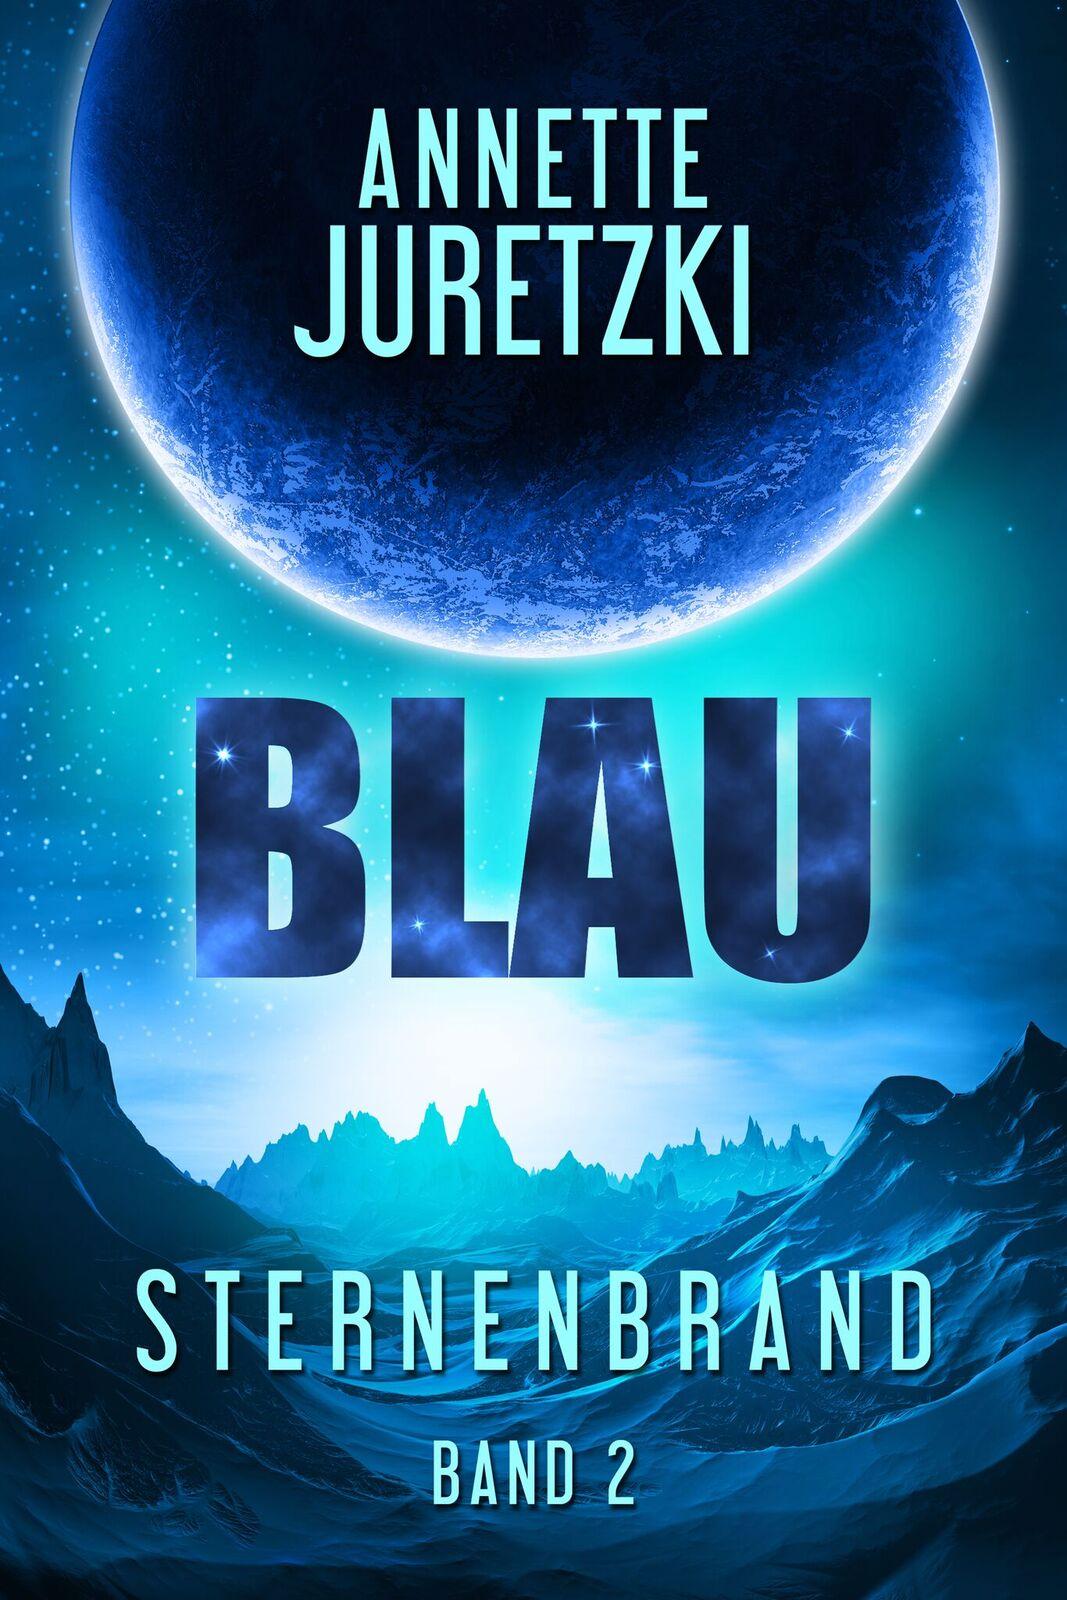 Blau Sternenbrand Cover Annette Juretzki